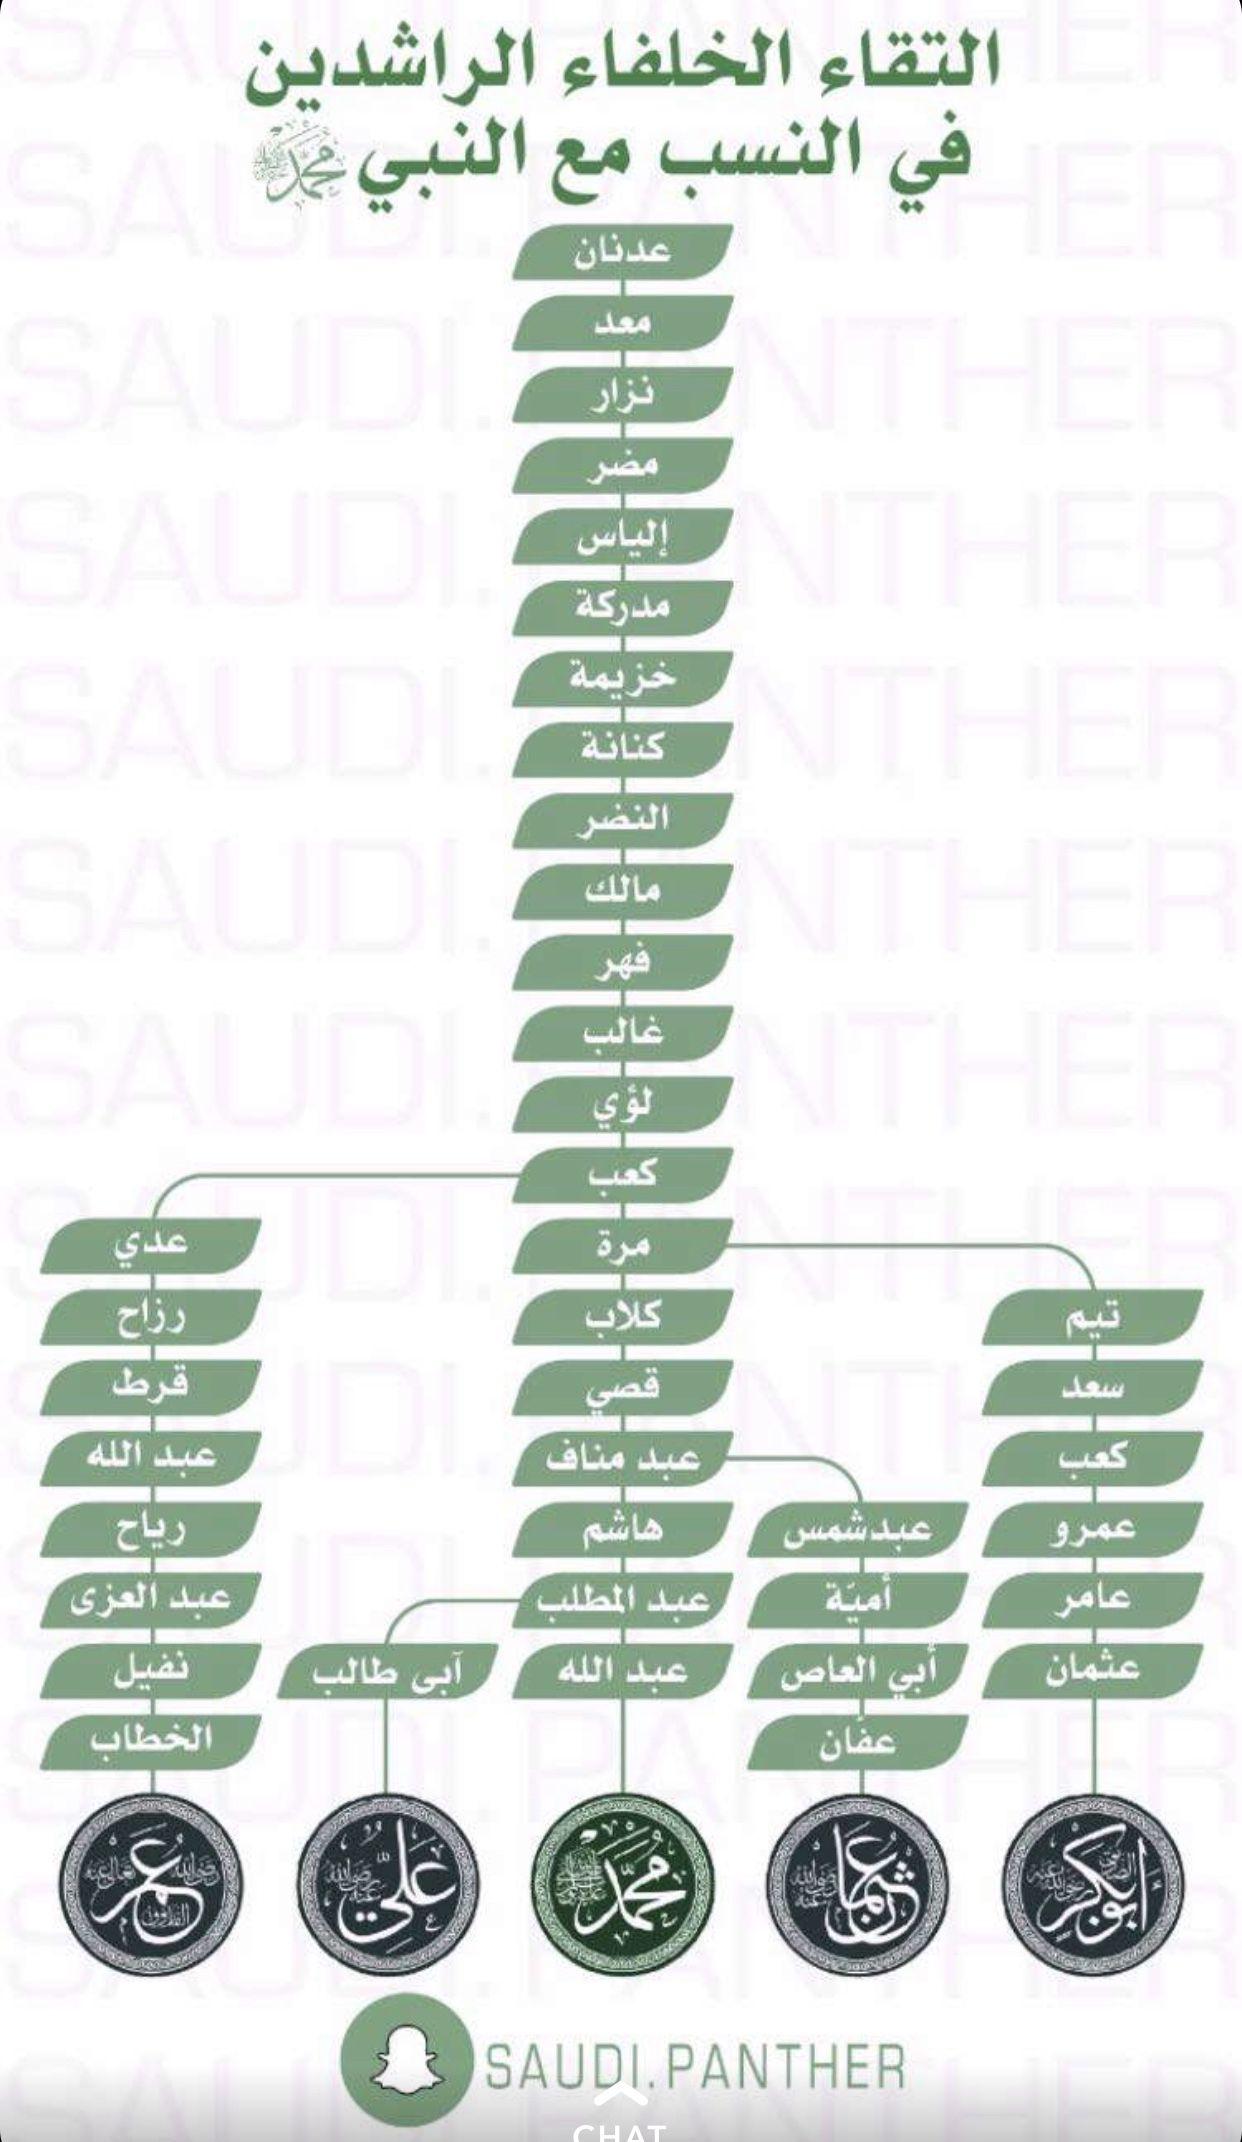 Pin By Re0o0ry ه م س ات ع اب ر ة On Informations معلومات Islam Facts Islam Beliefs Islamic Teachings